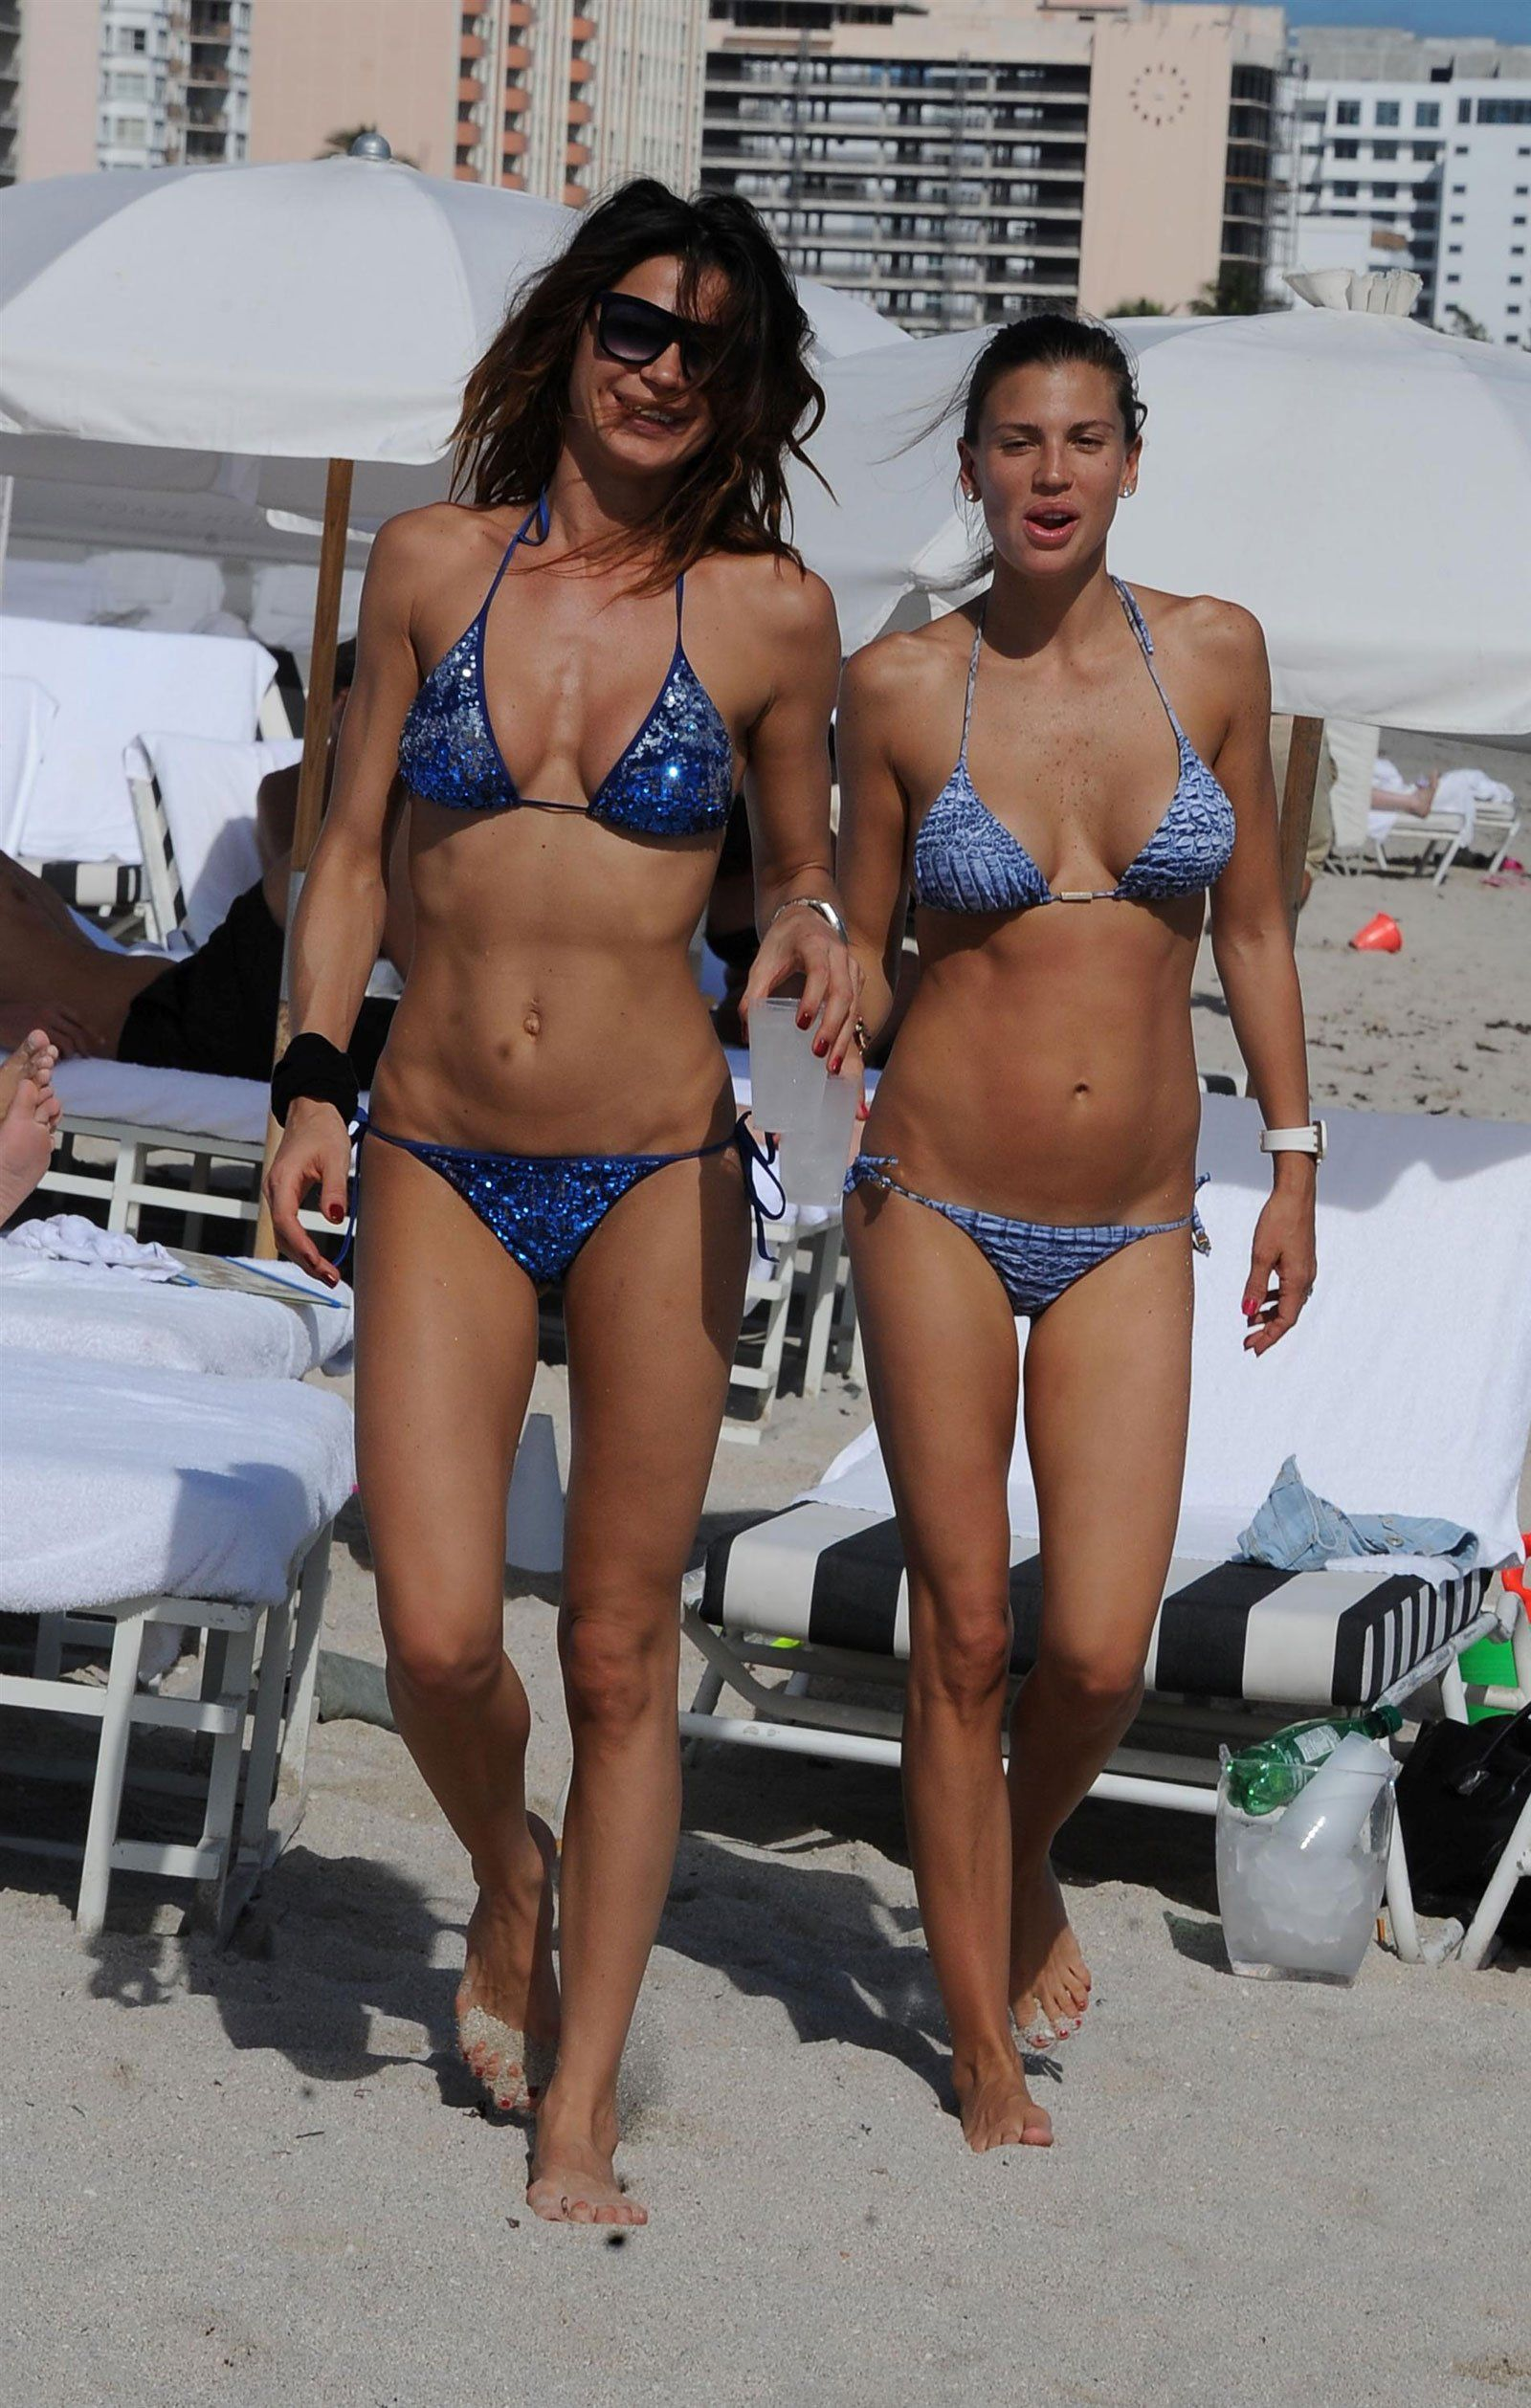 Branford bikini beth well, not